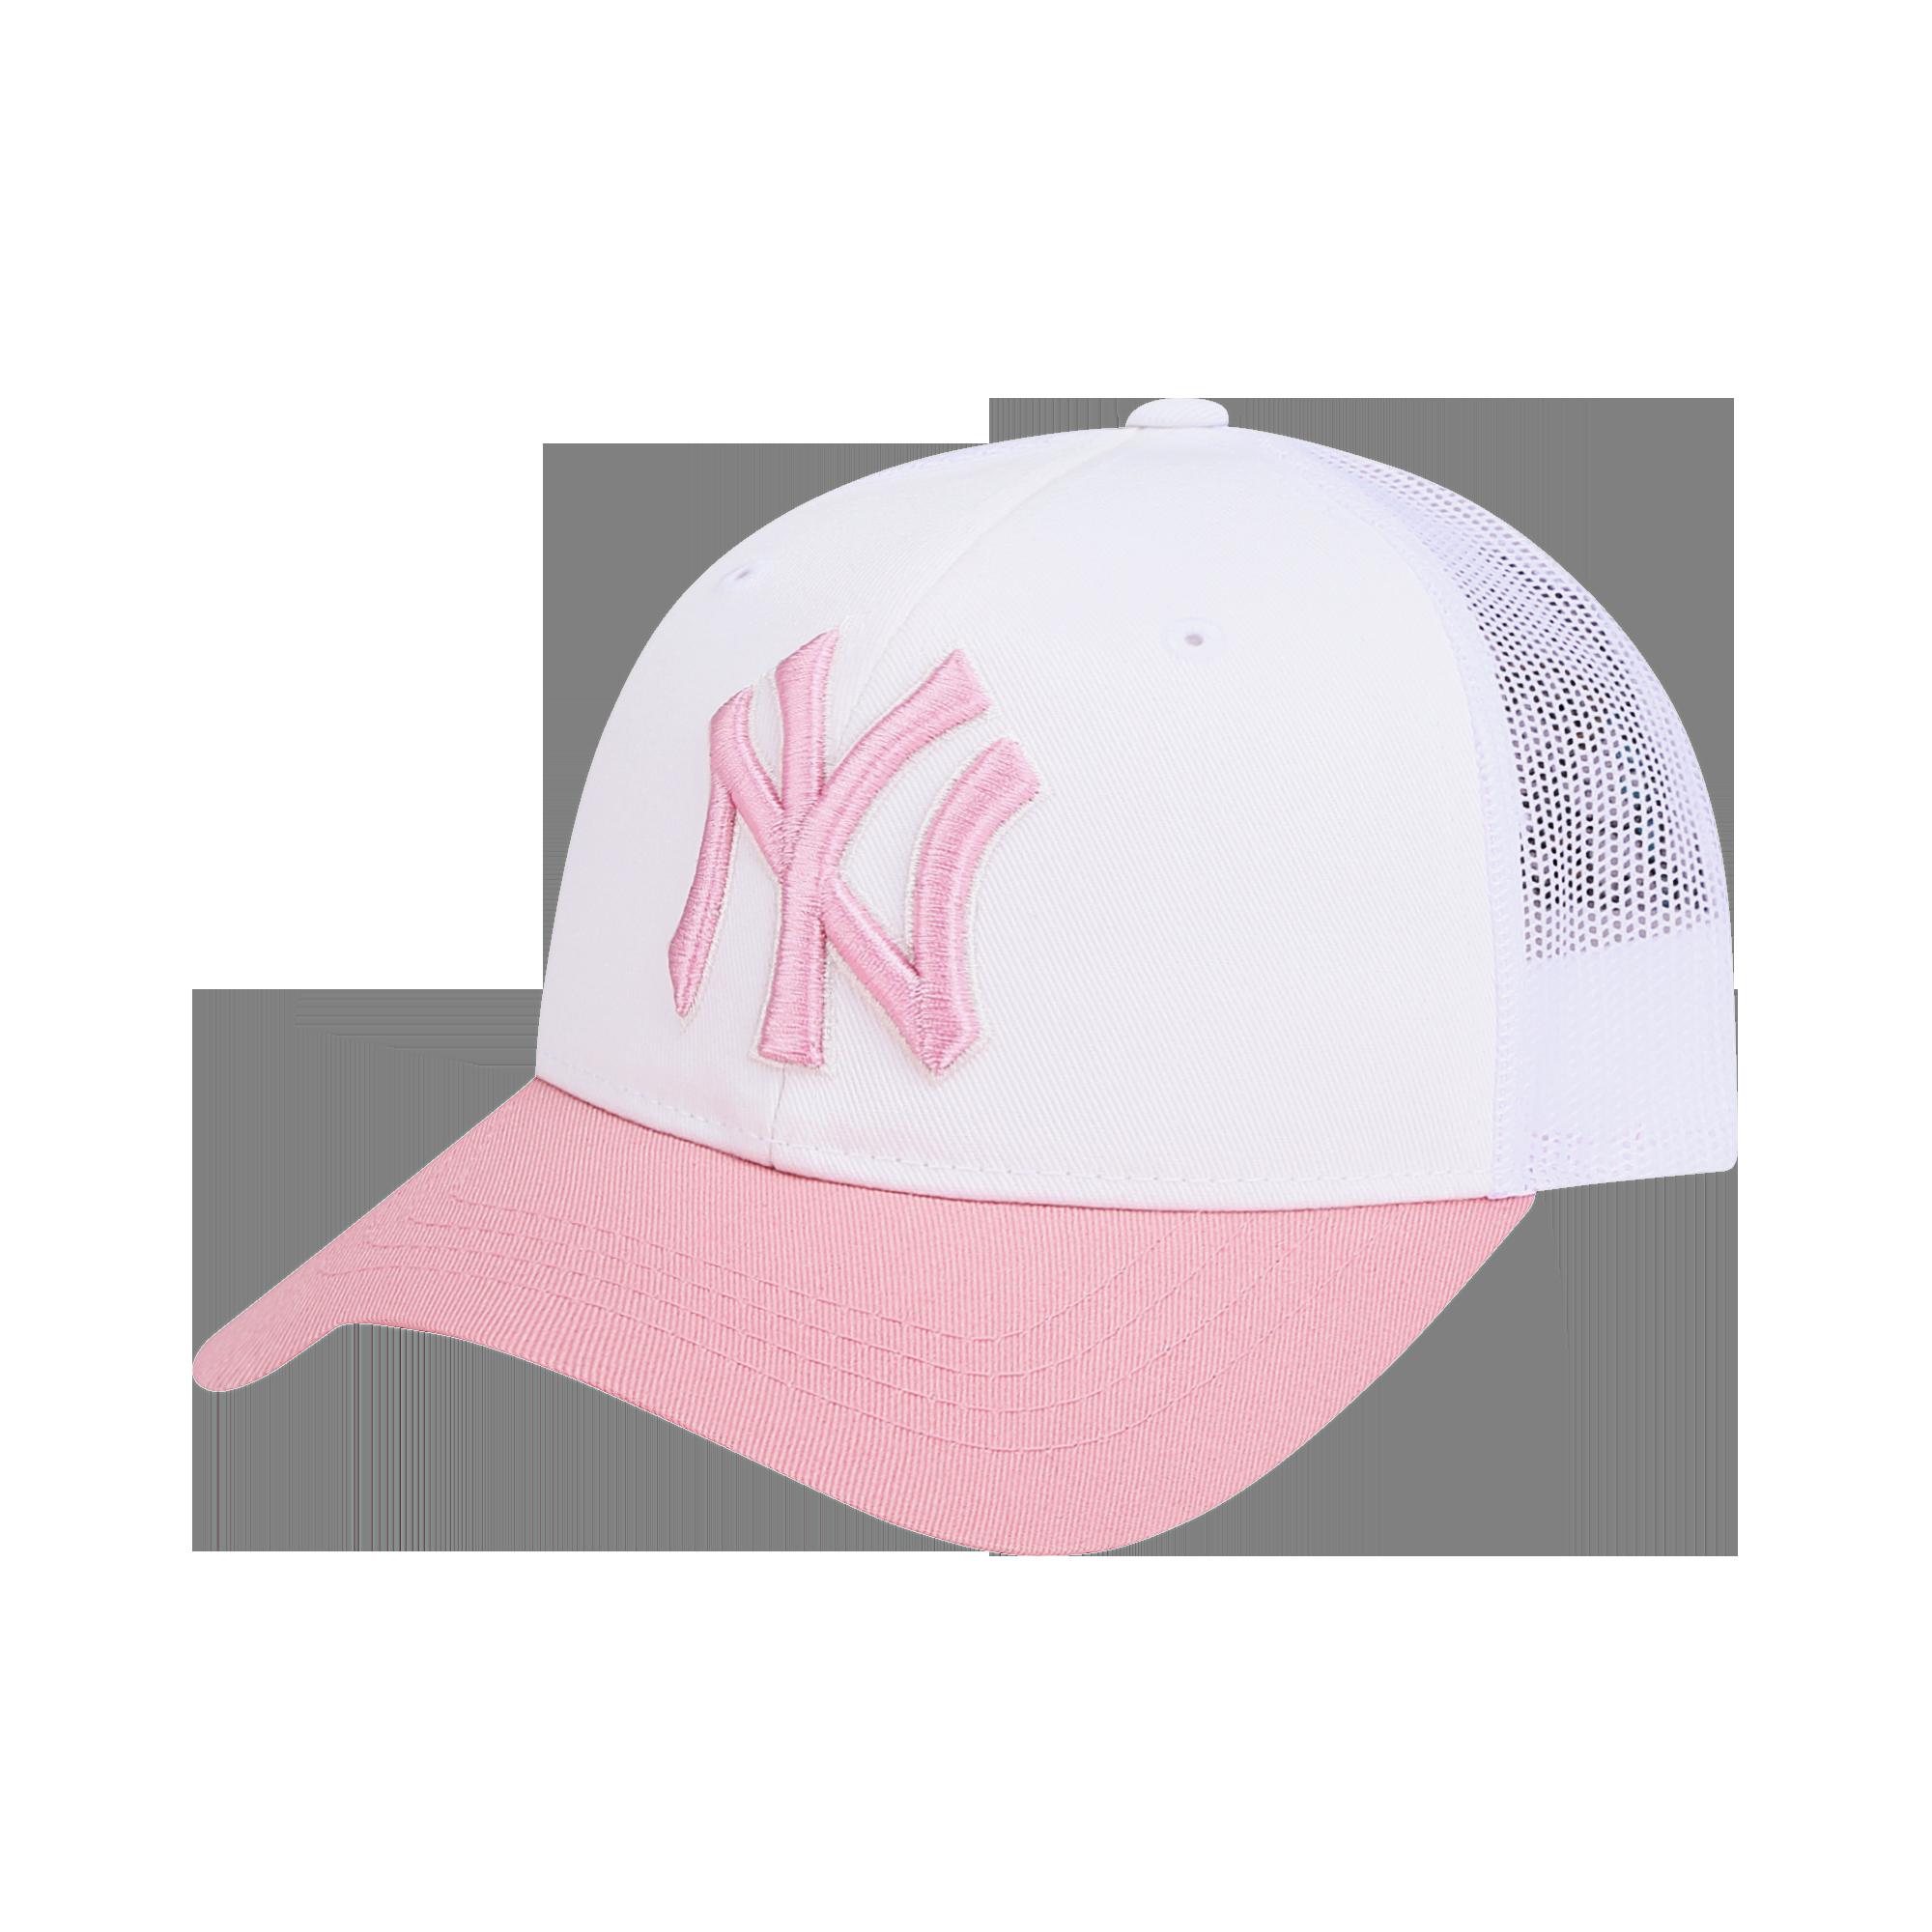 NEW YORK YANKEES KINO MESH CURVED CAP